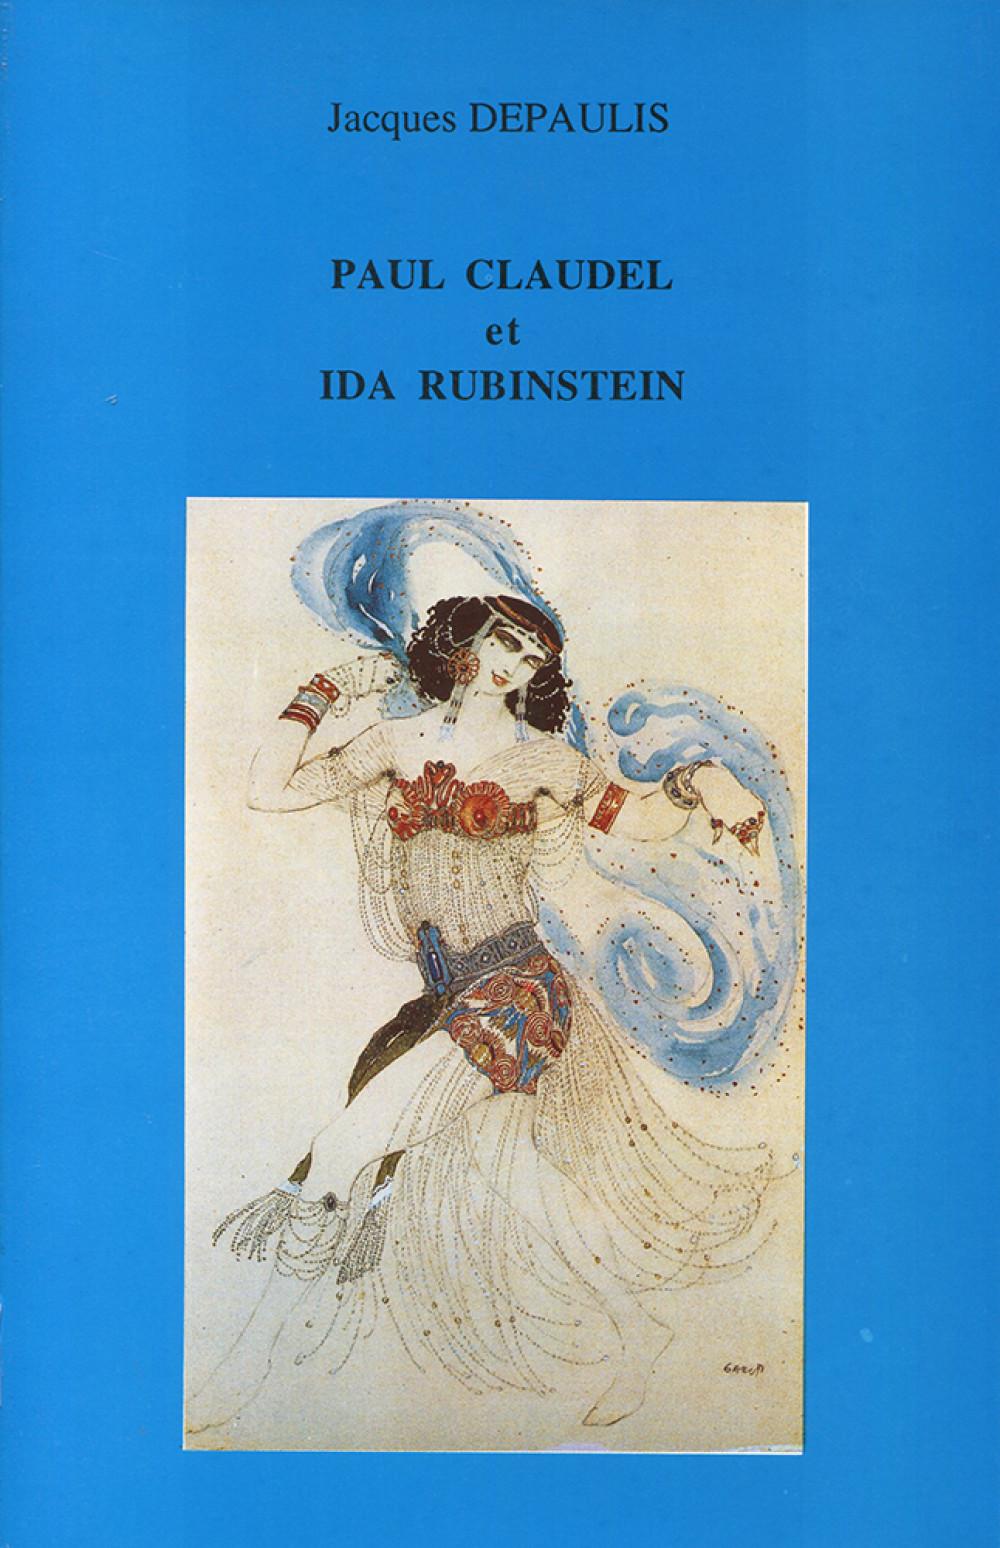 Paul Claudel et Ida Rubinstein